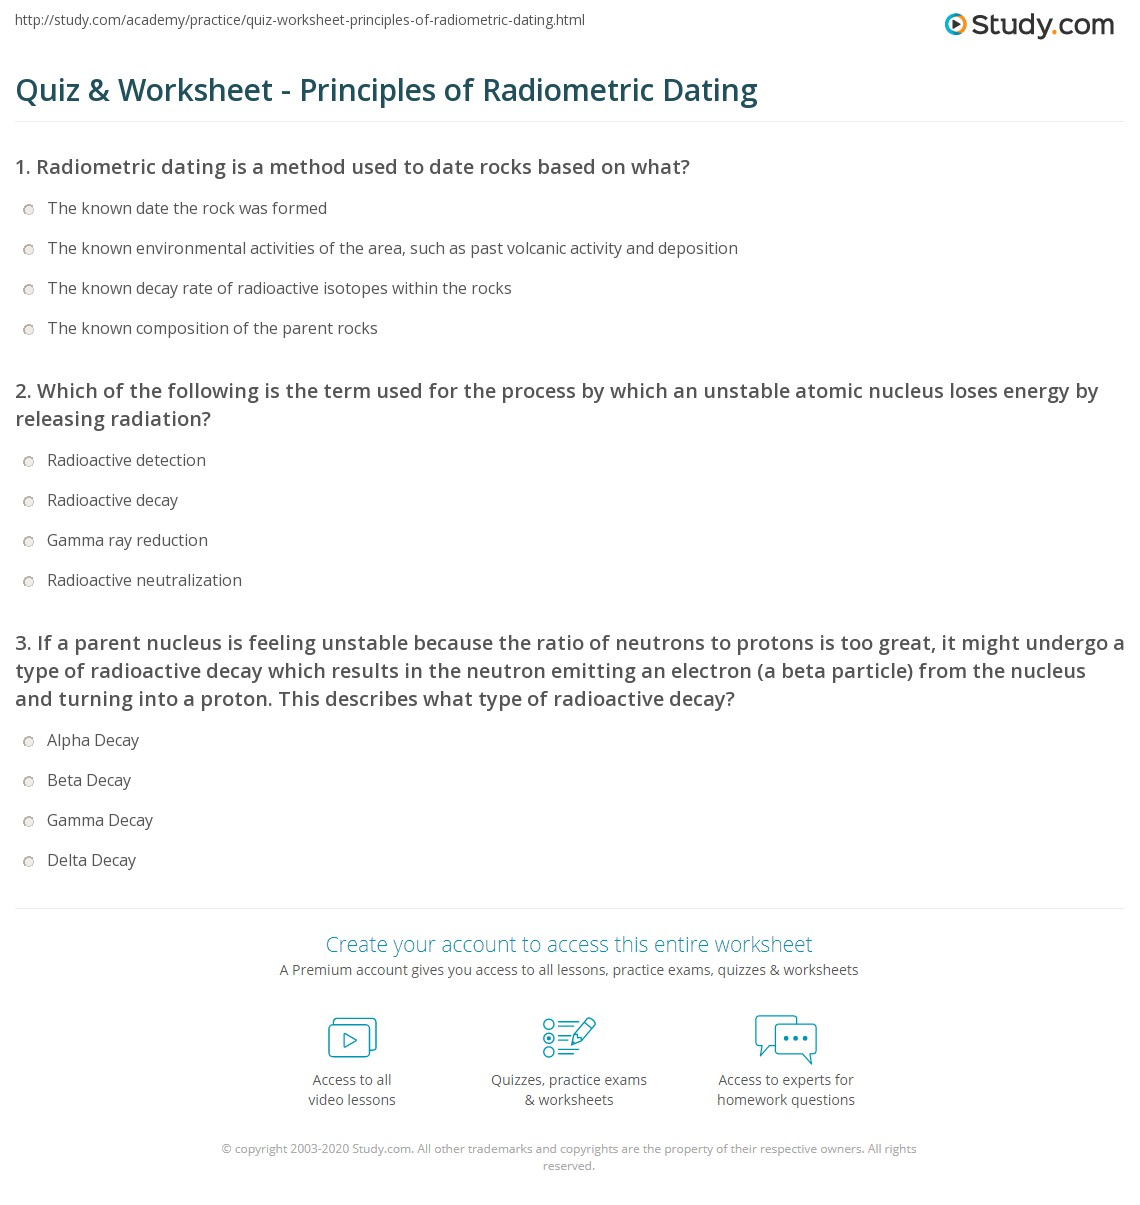 Radioactive Dating Worksheet Answer Key